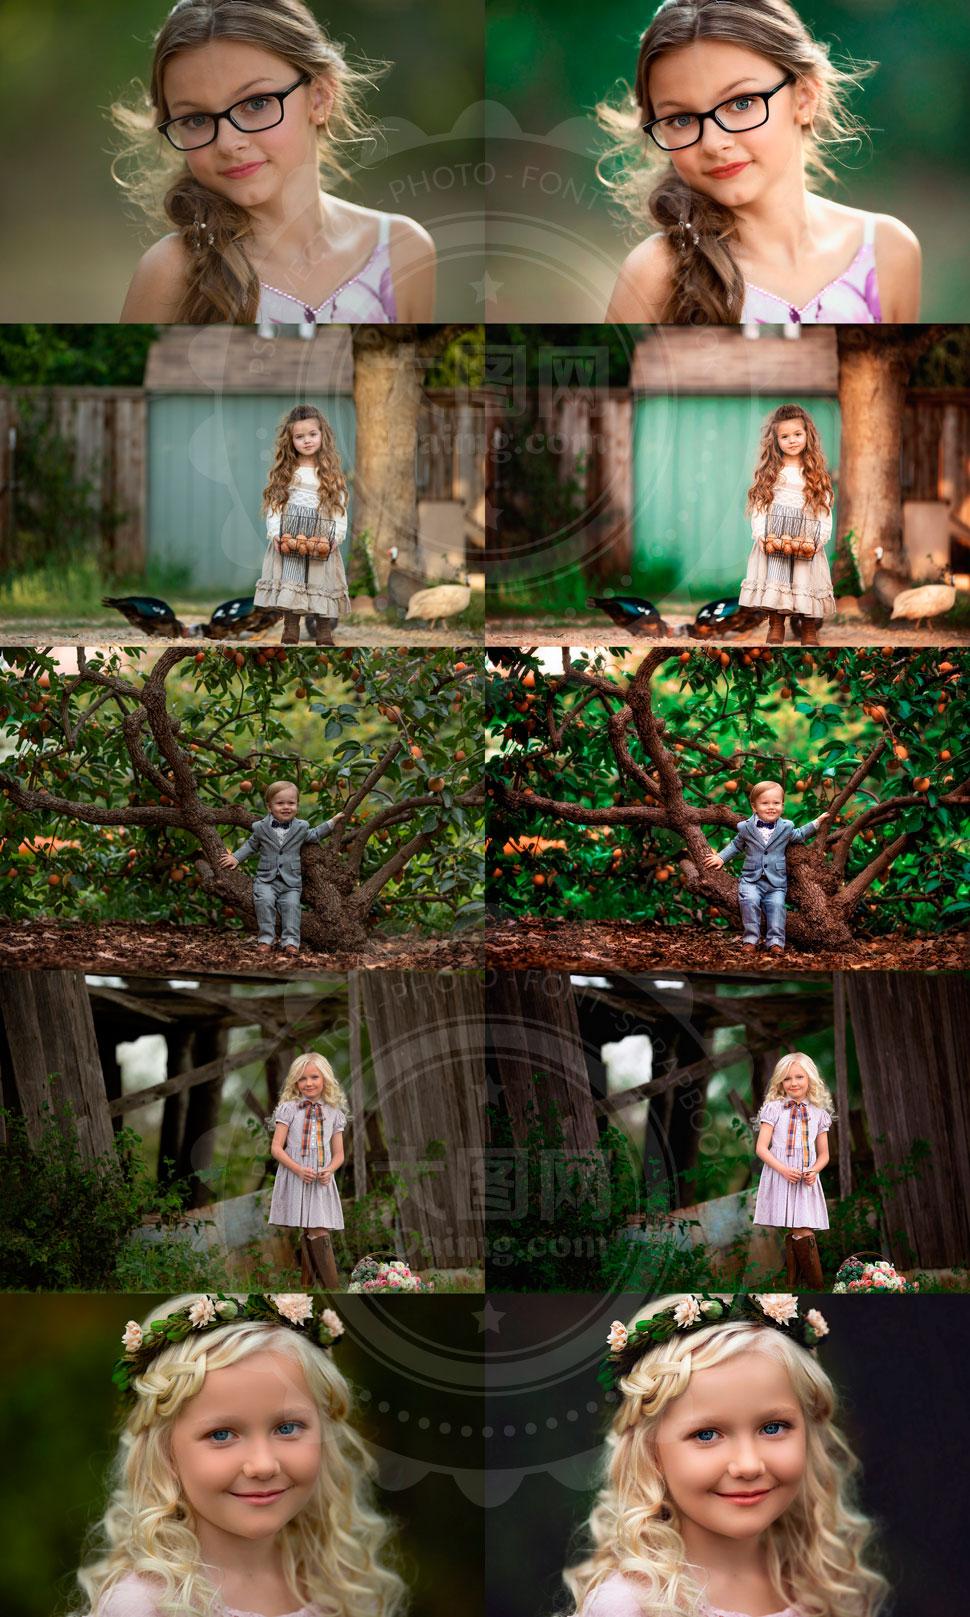 GTG系列儿童照片甜美暖色效果PS动作